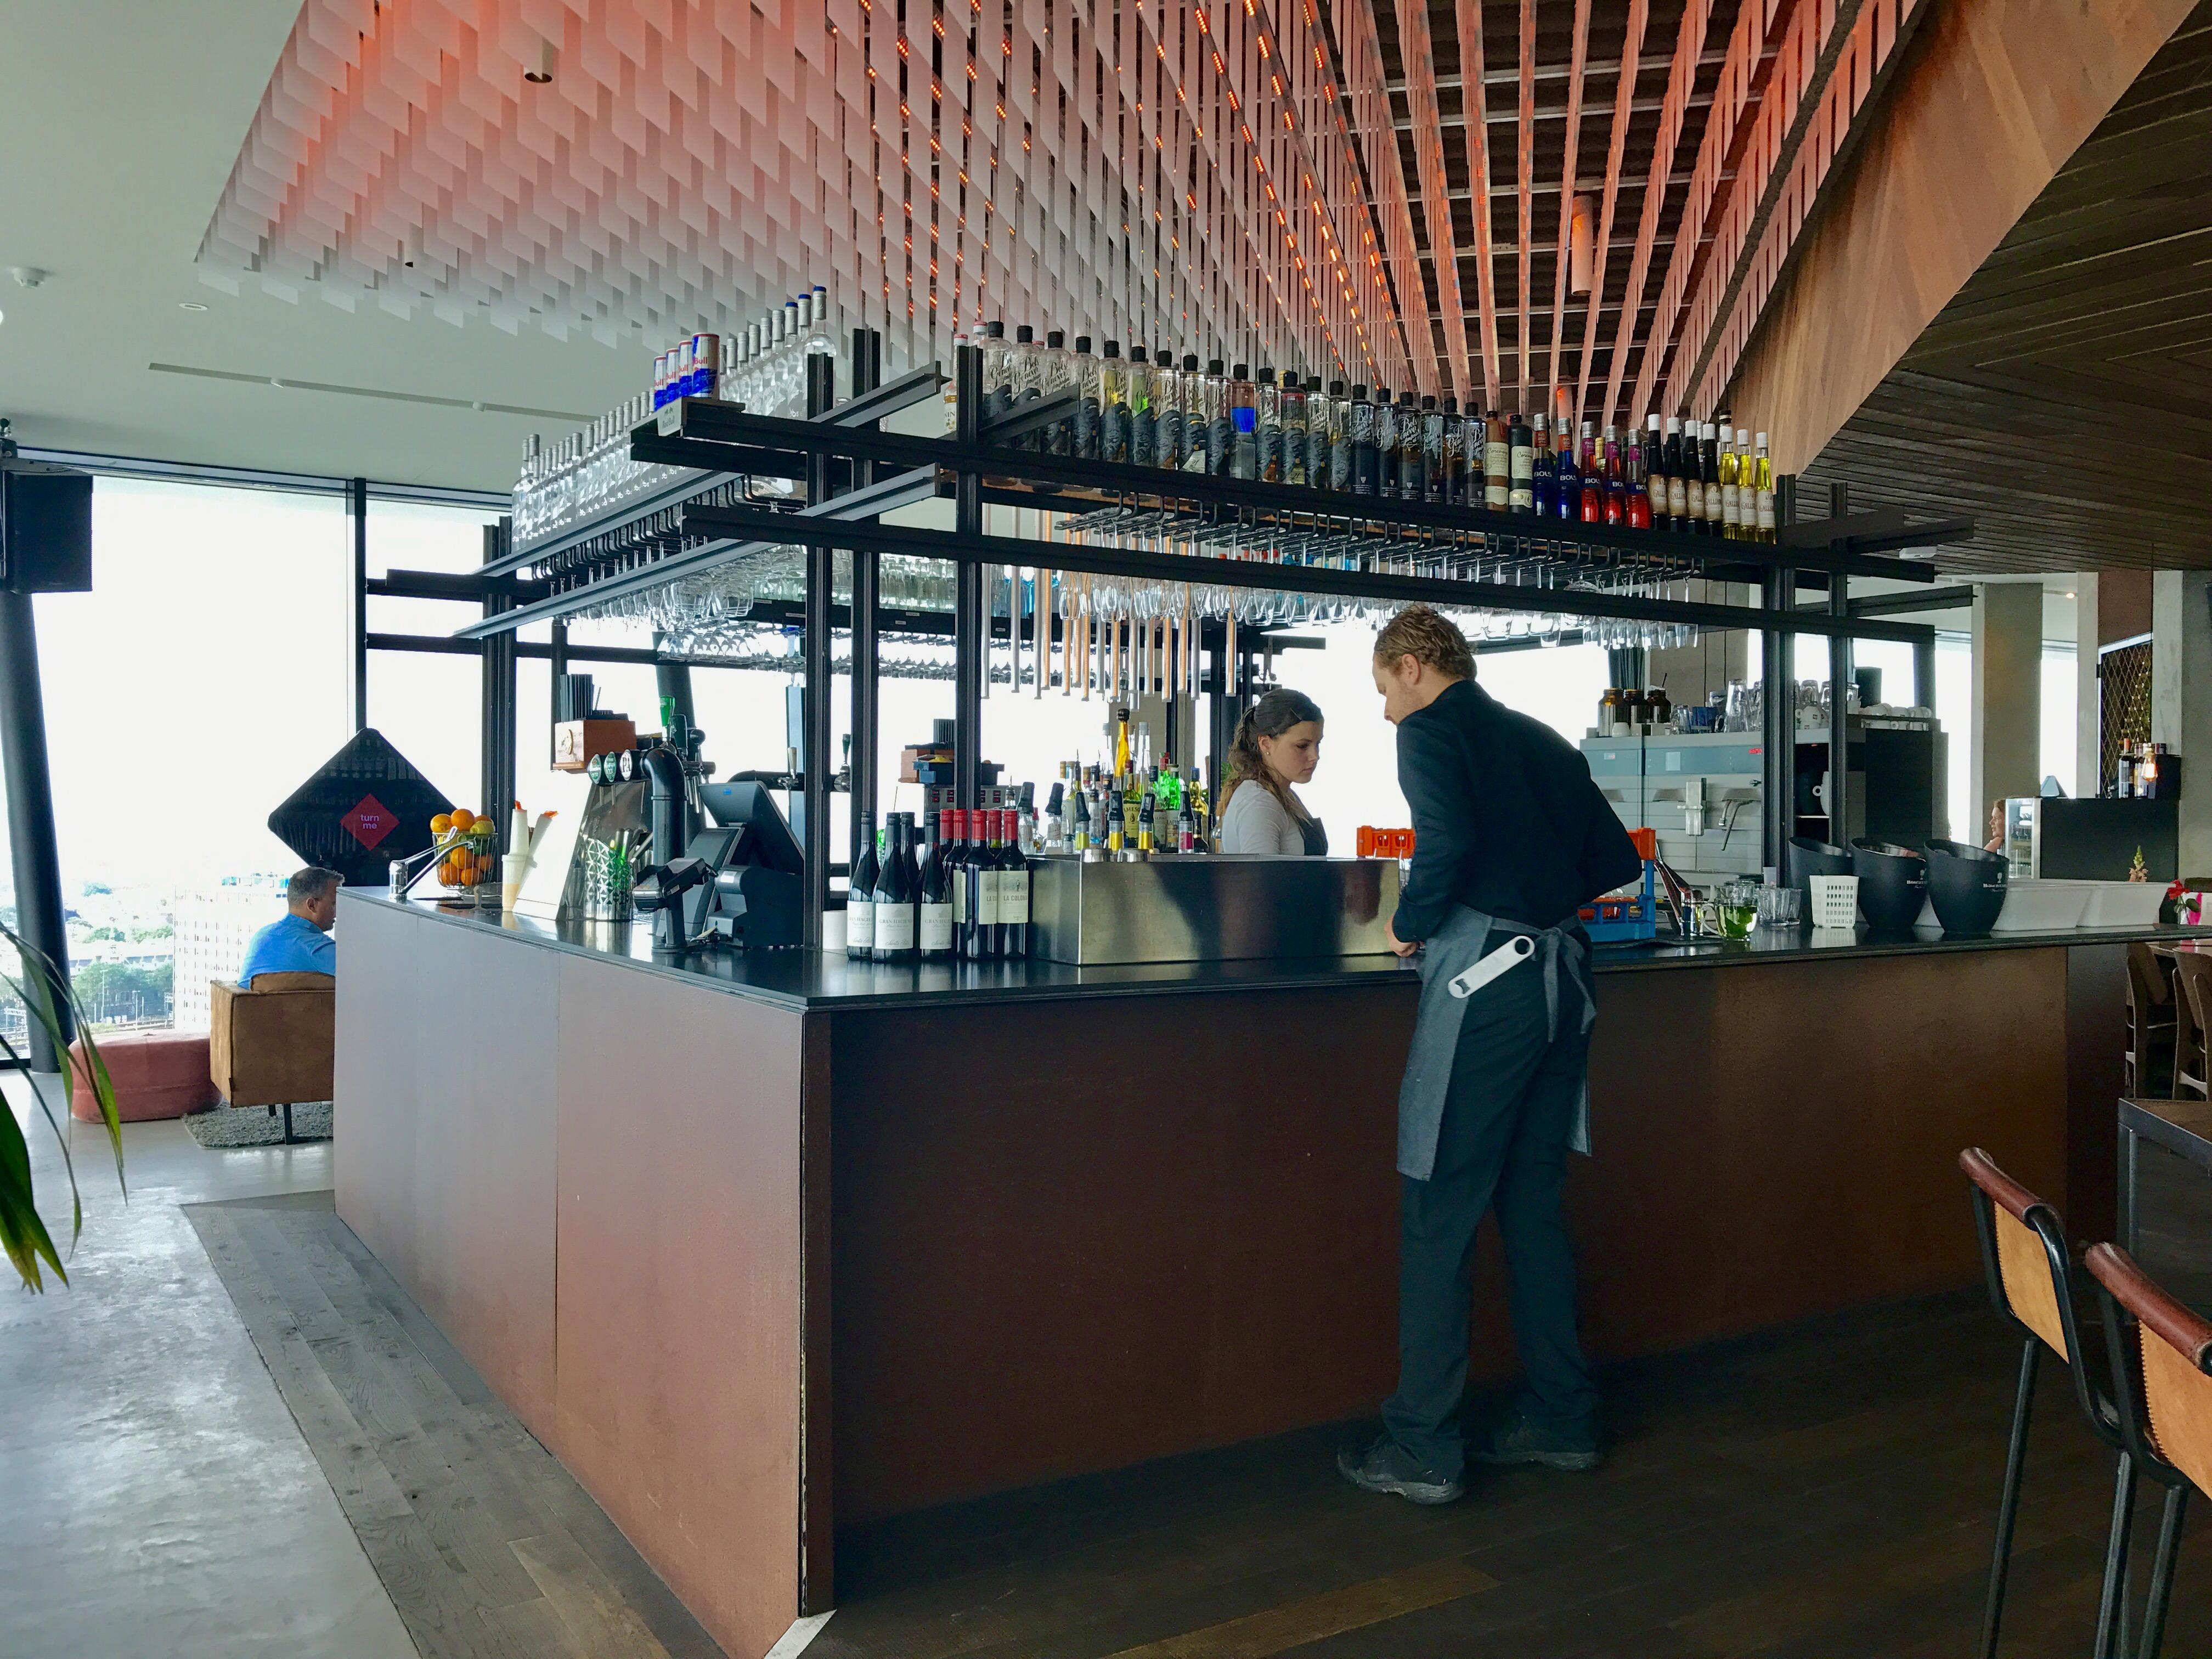 lookout_bar_amsterdam_lustforthesublime